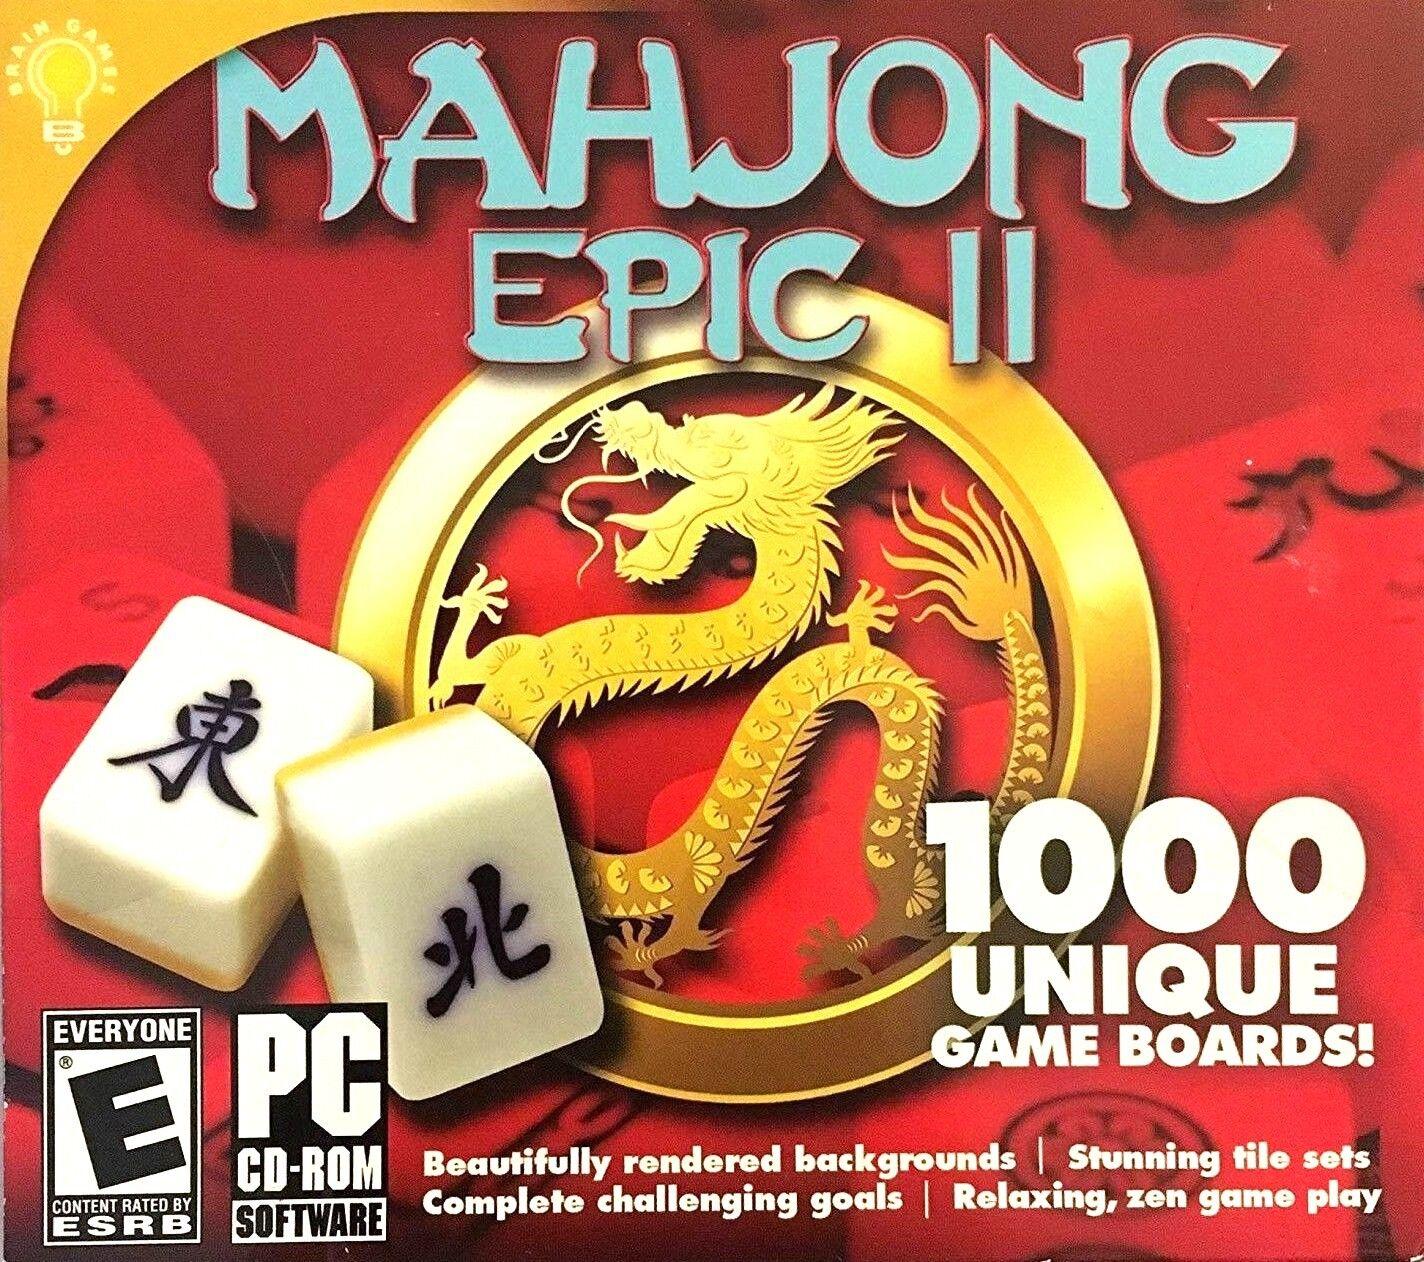 Computer Games - Mahjong Epic II PC Games Windows 10 8 7 XP Computer mah jong epic 2 puzzle